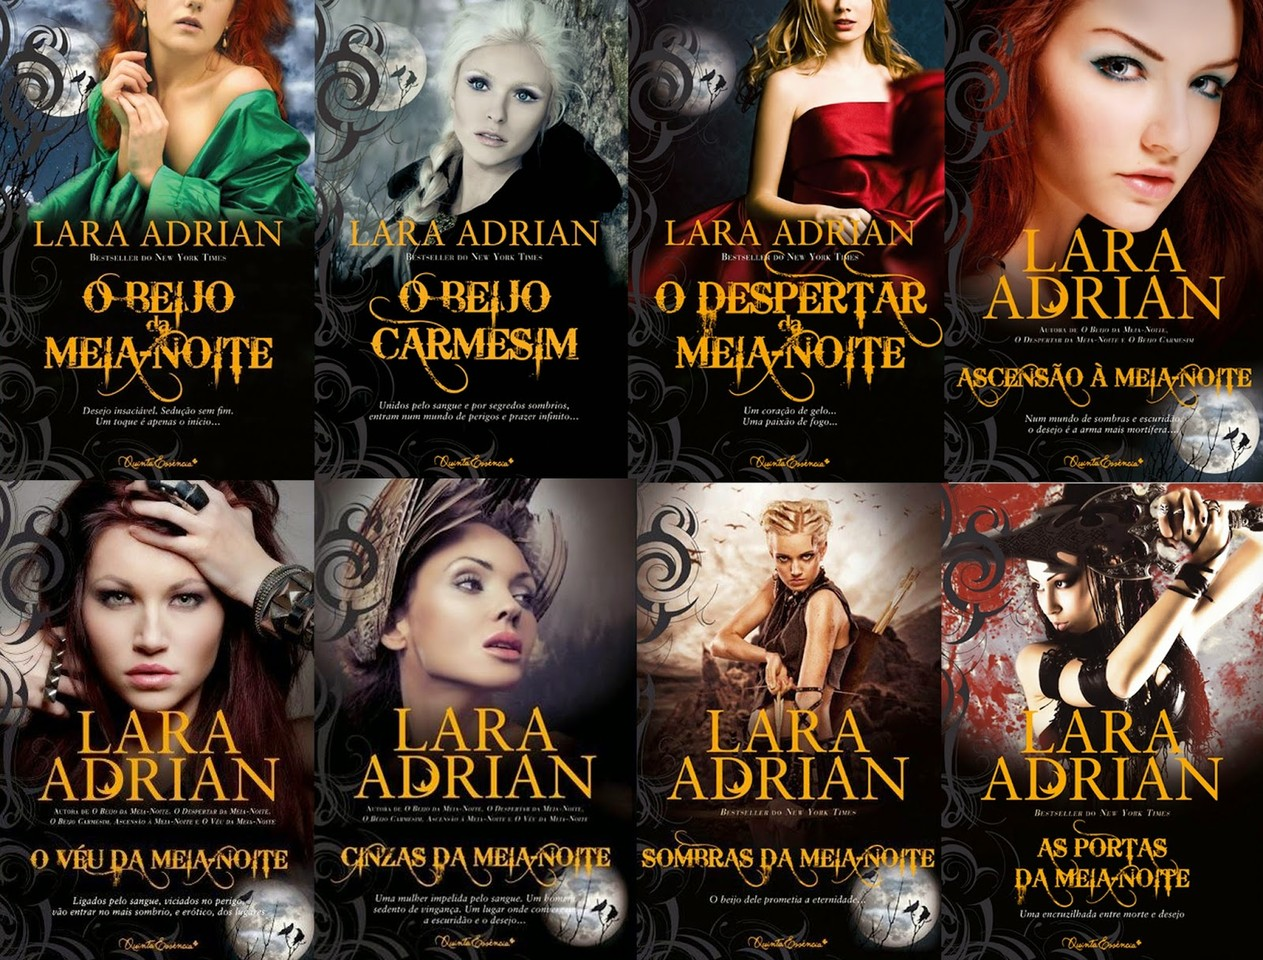 Lara Adrian copy.jpg